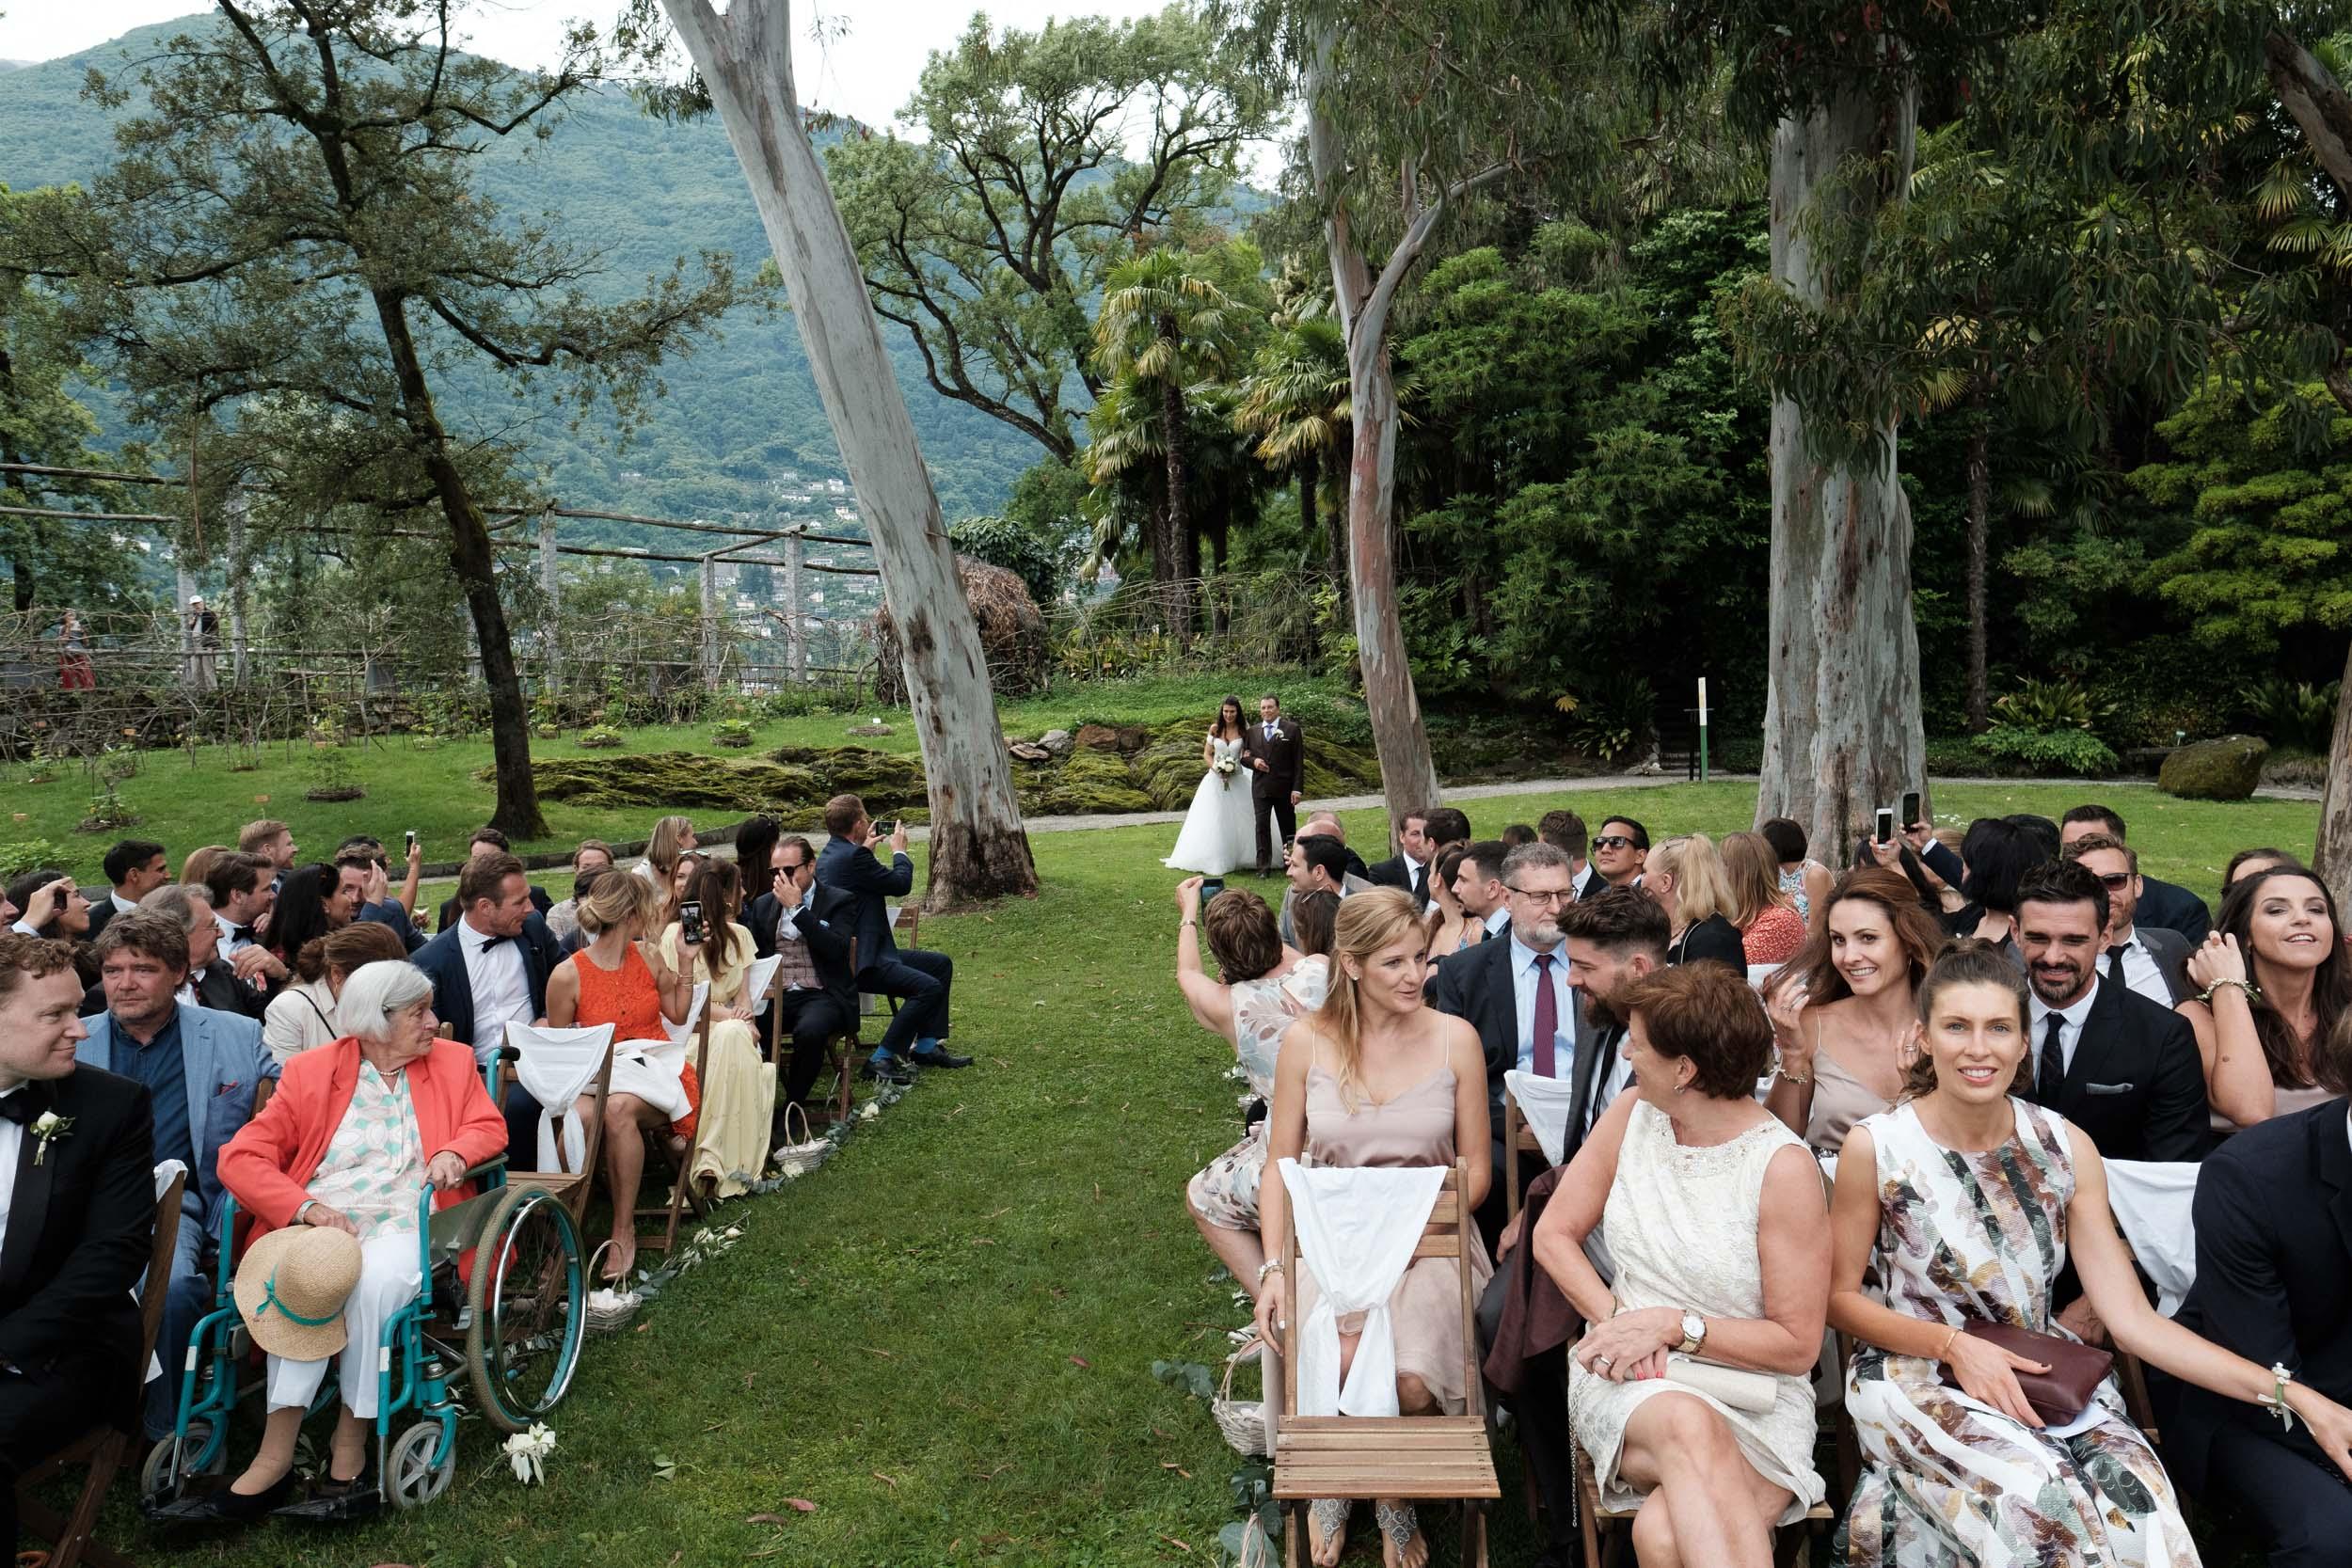 olivia-andreas-wedding-switzerland-285.jpg